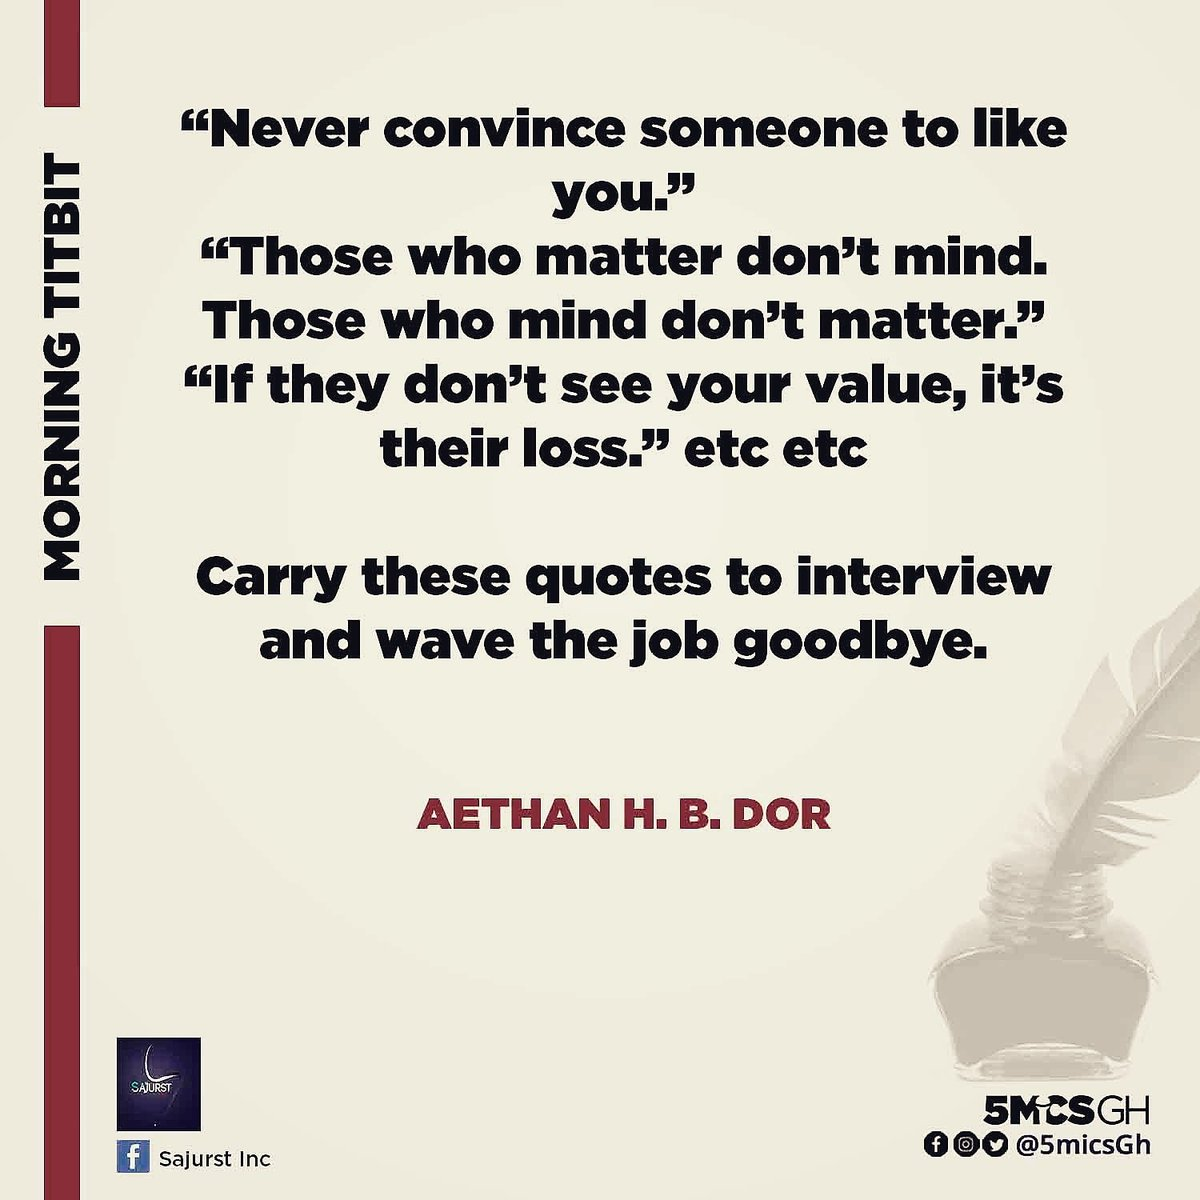 Friyaaaayyyy #morningtidbit  #TGIF #NotSoSilly #Never #Convince #Like #Matter #Mind #Value #Loss #Quotes #Interview #Wave #Job #Goodbye #Weekend #HappyWeekend